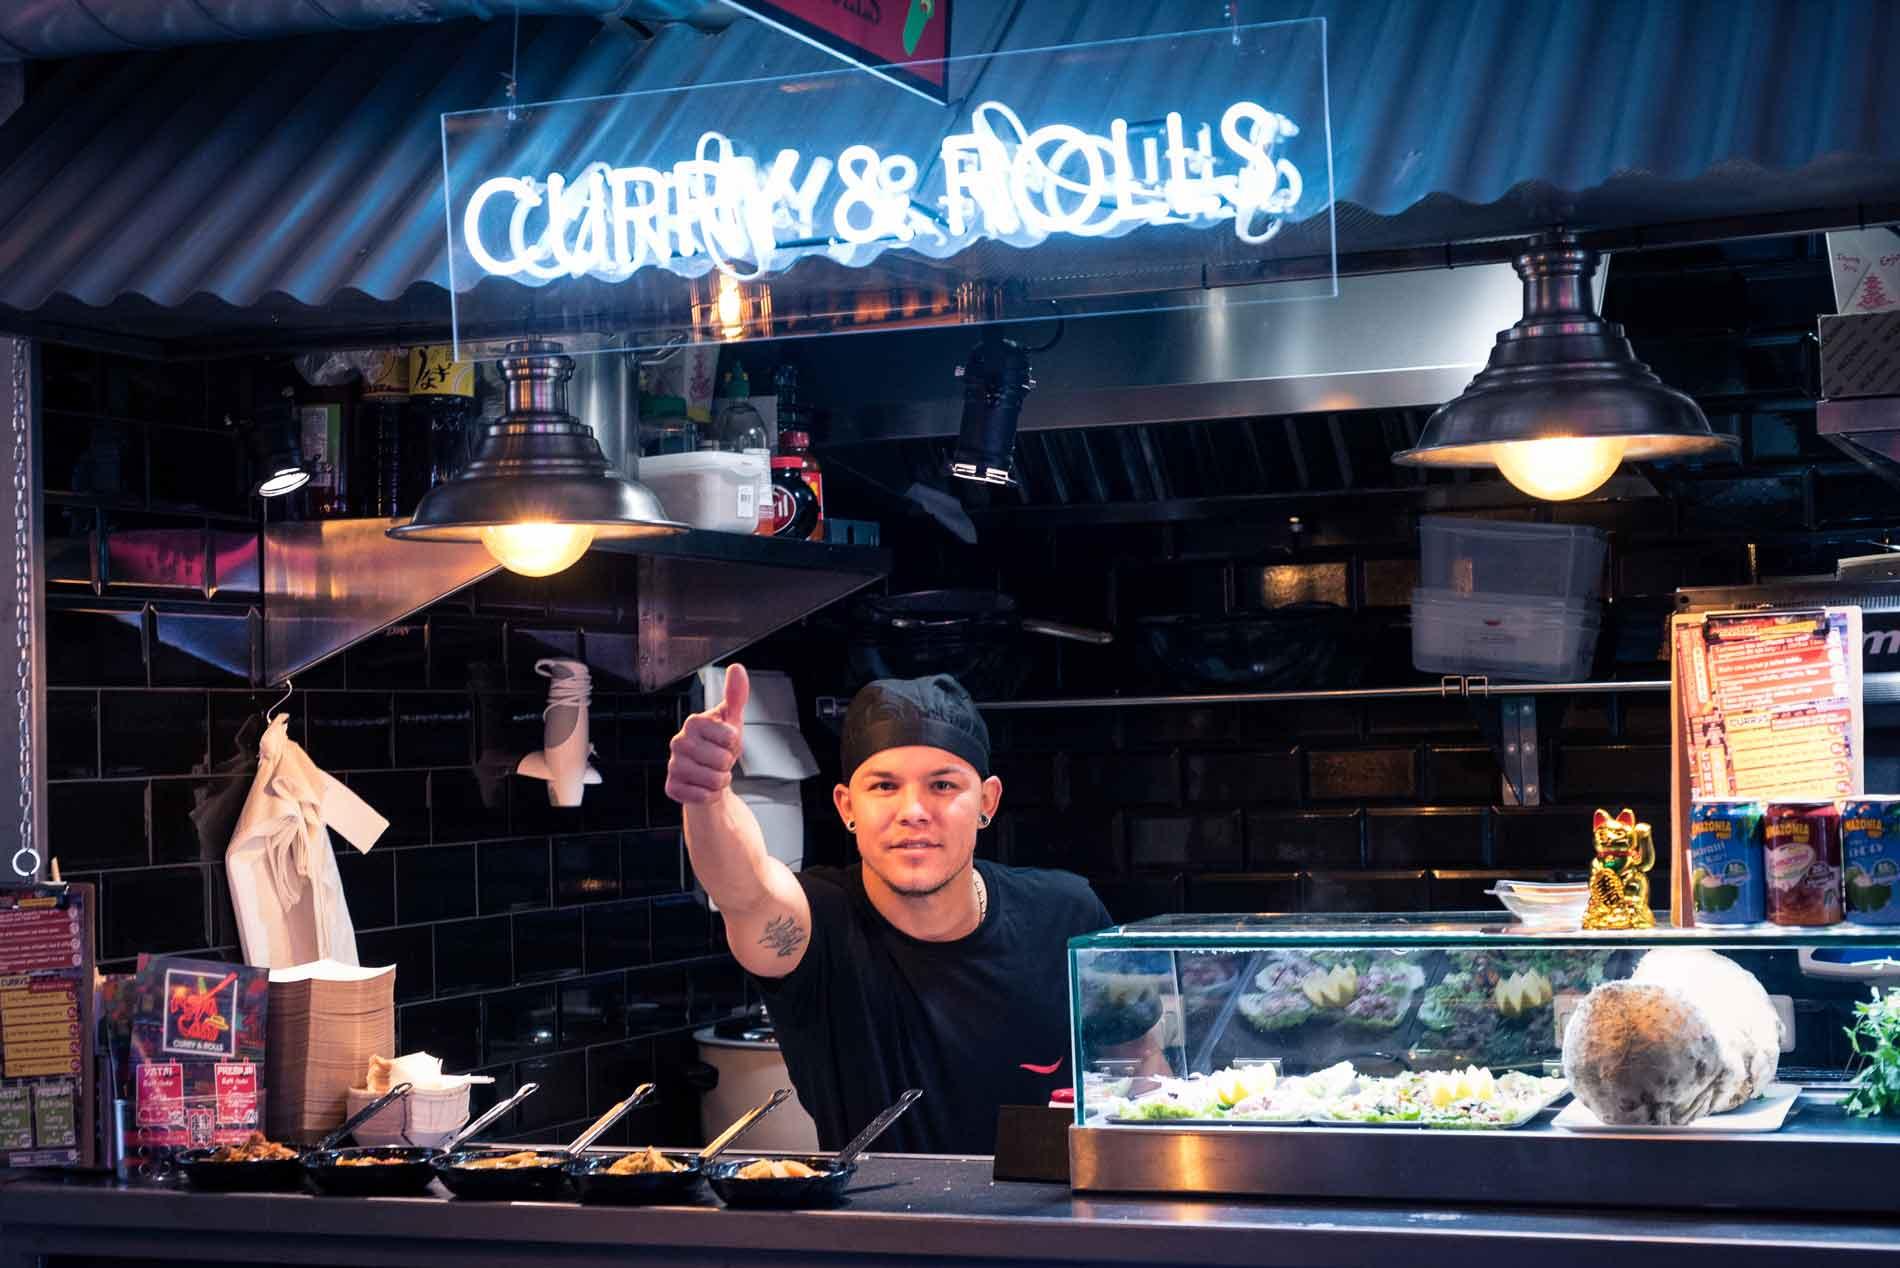 Yatai Market, street food asiática en pleno centro